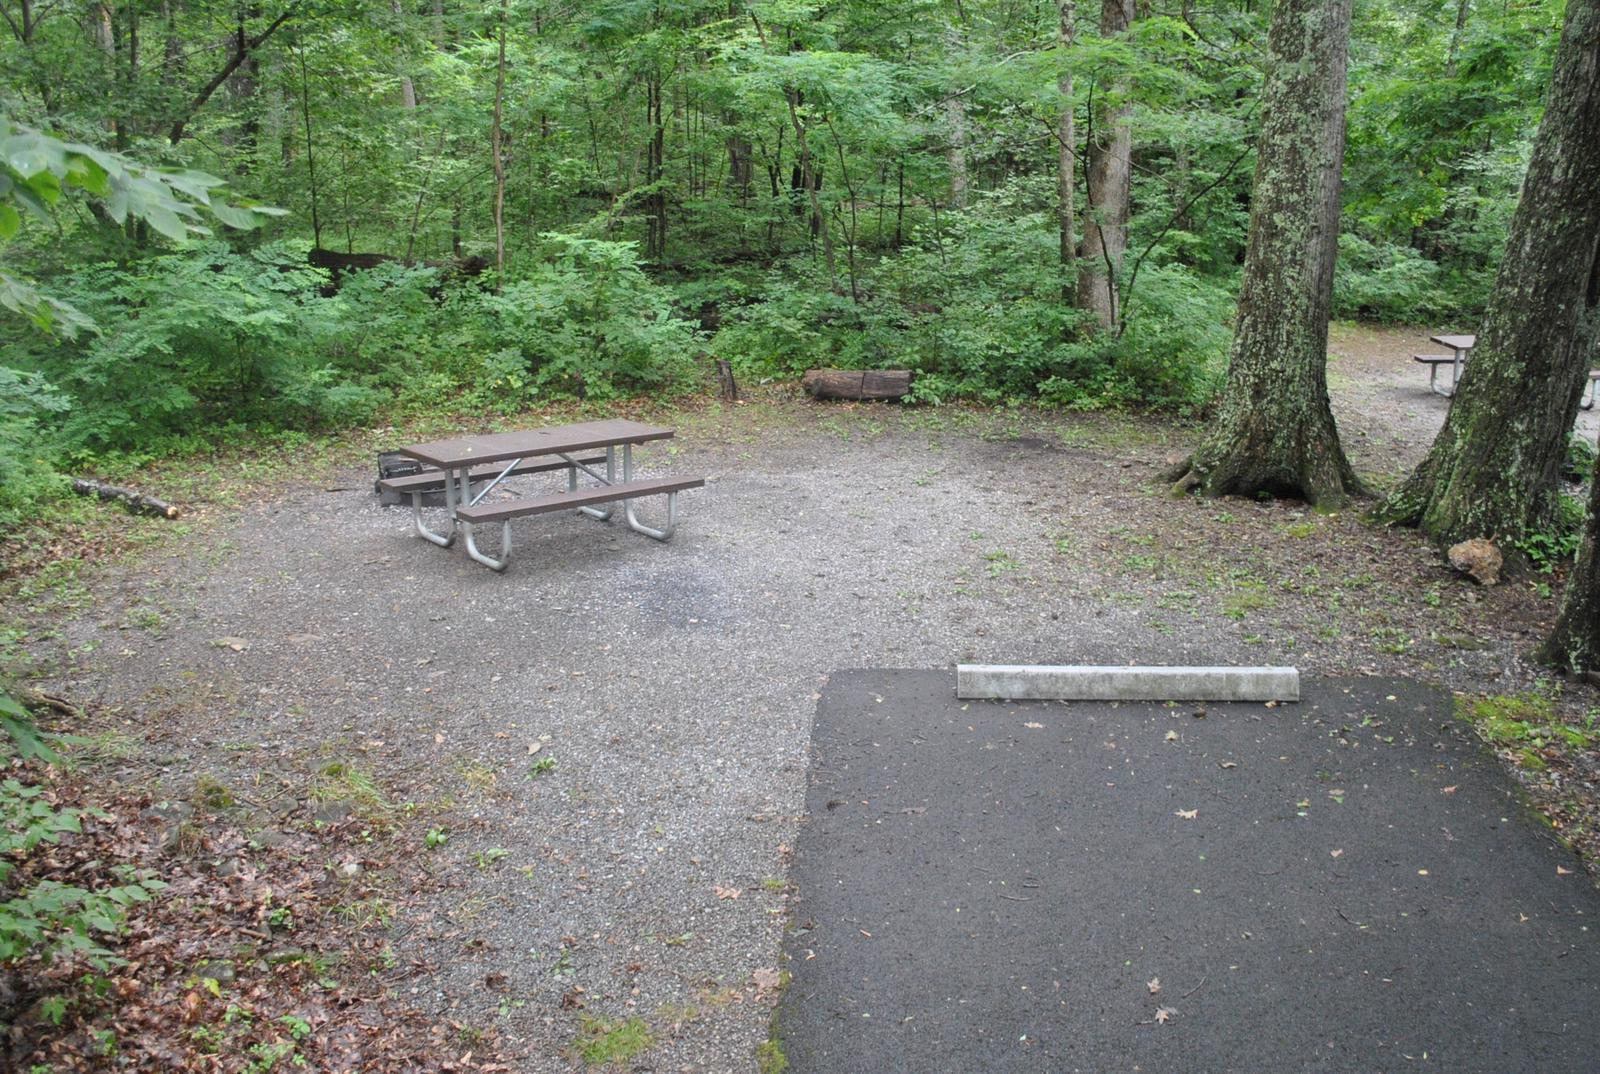 Mathews Arm Campground – Site A005